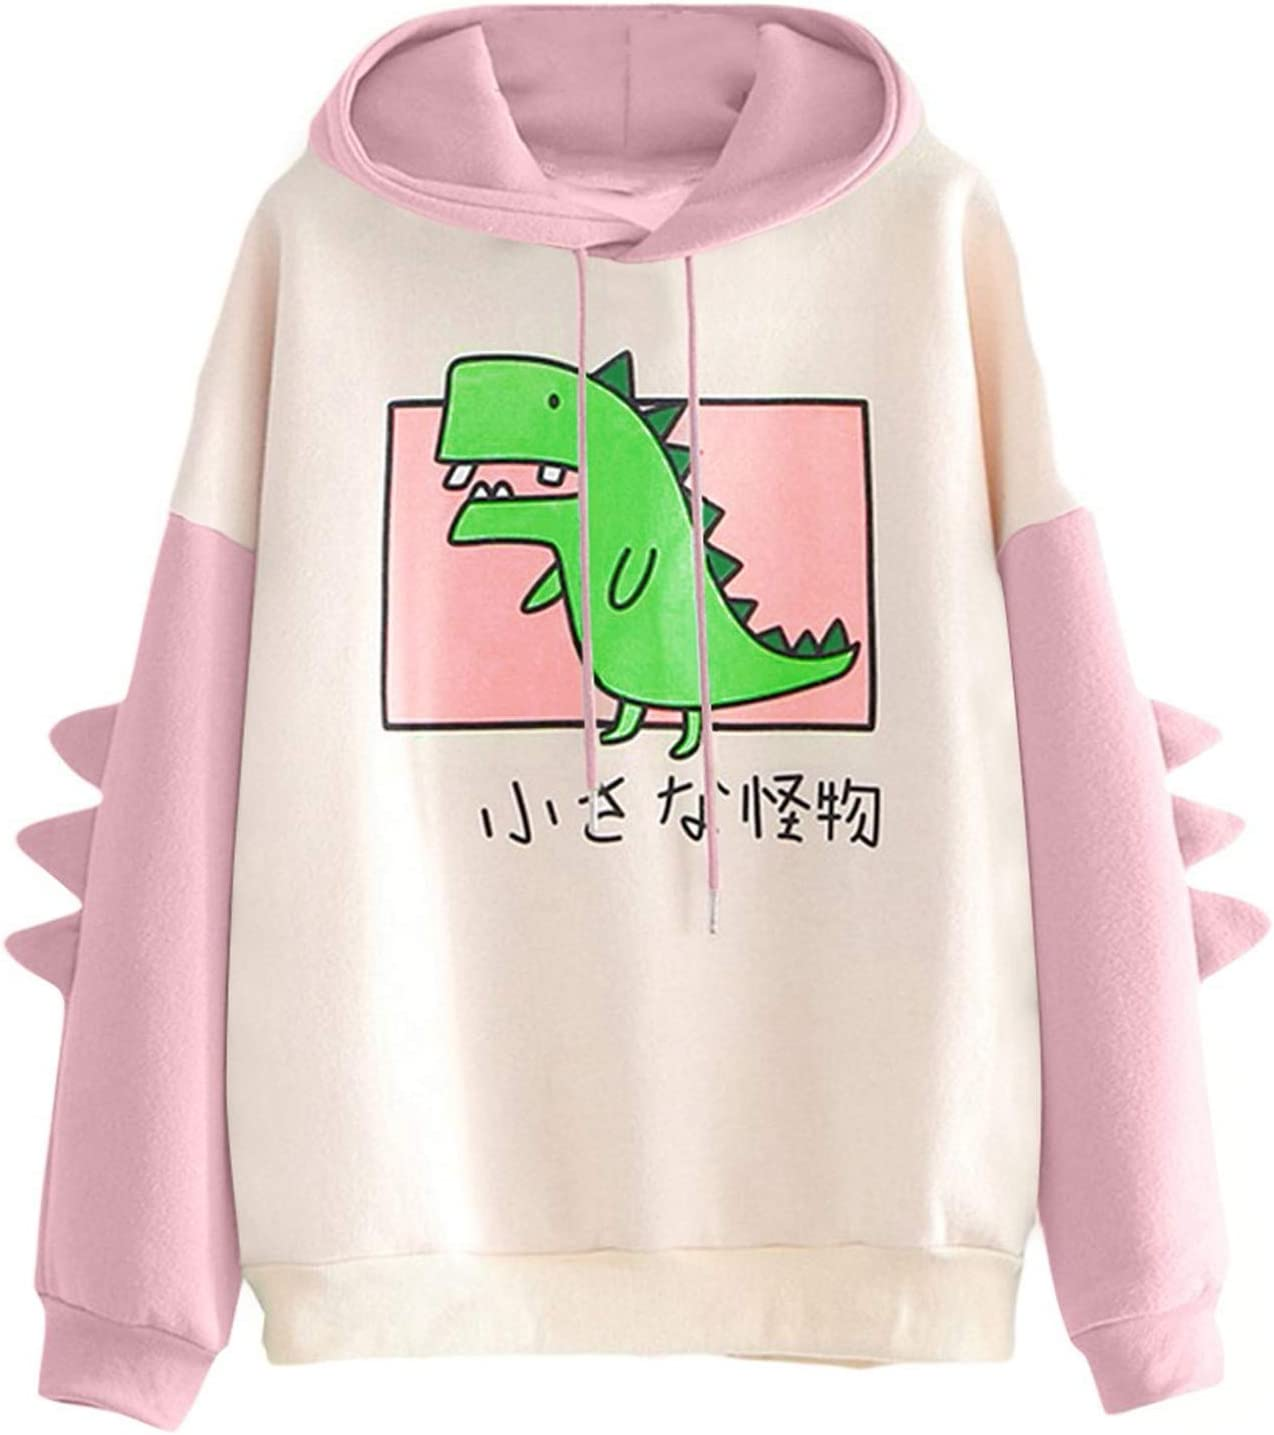 Eoailr Sweatshirt for Women Teens Cute Cosplay Rare Baltimore Mall Dinosaur Animal